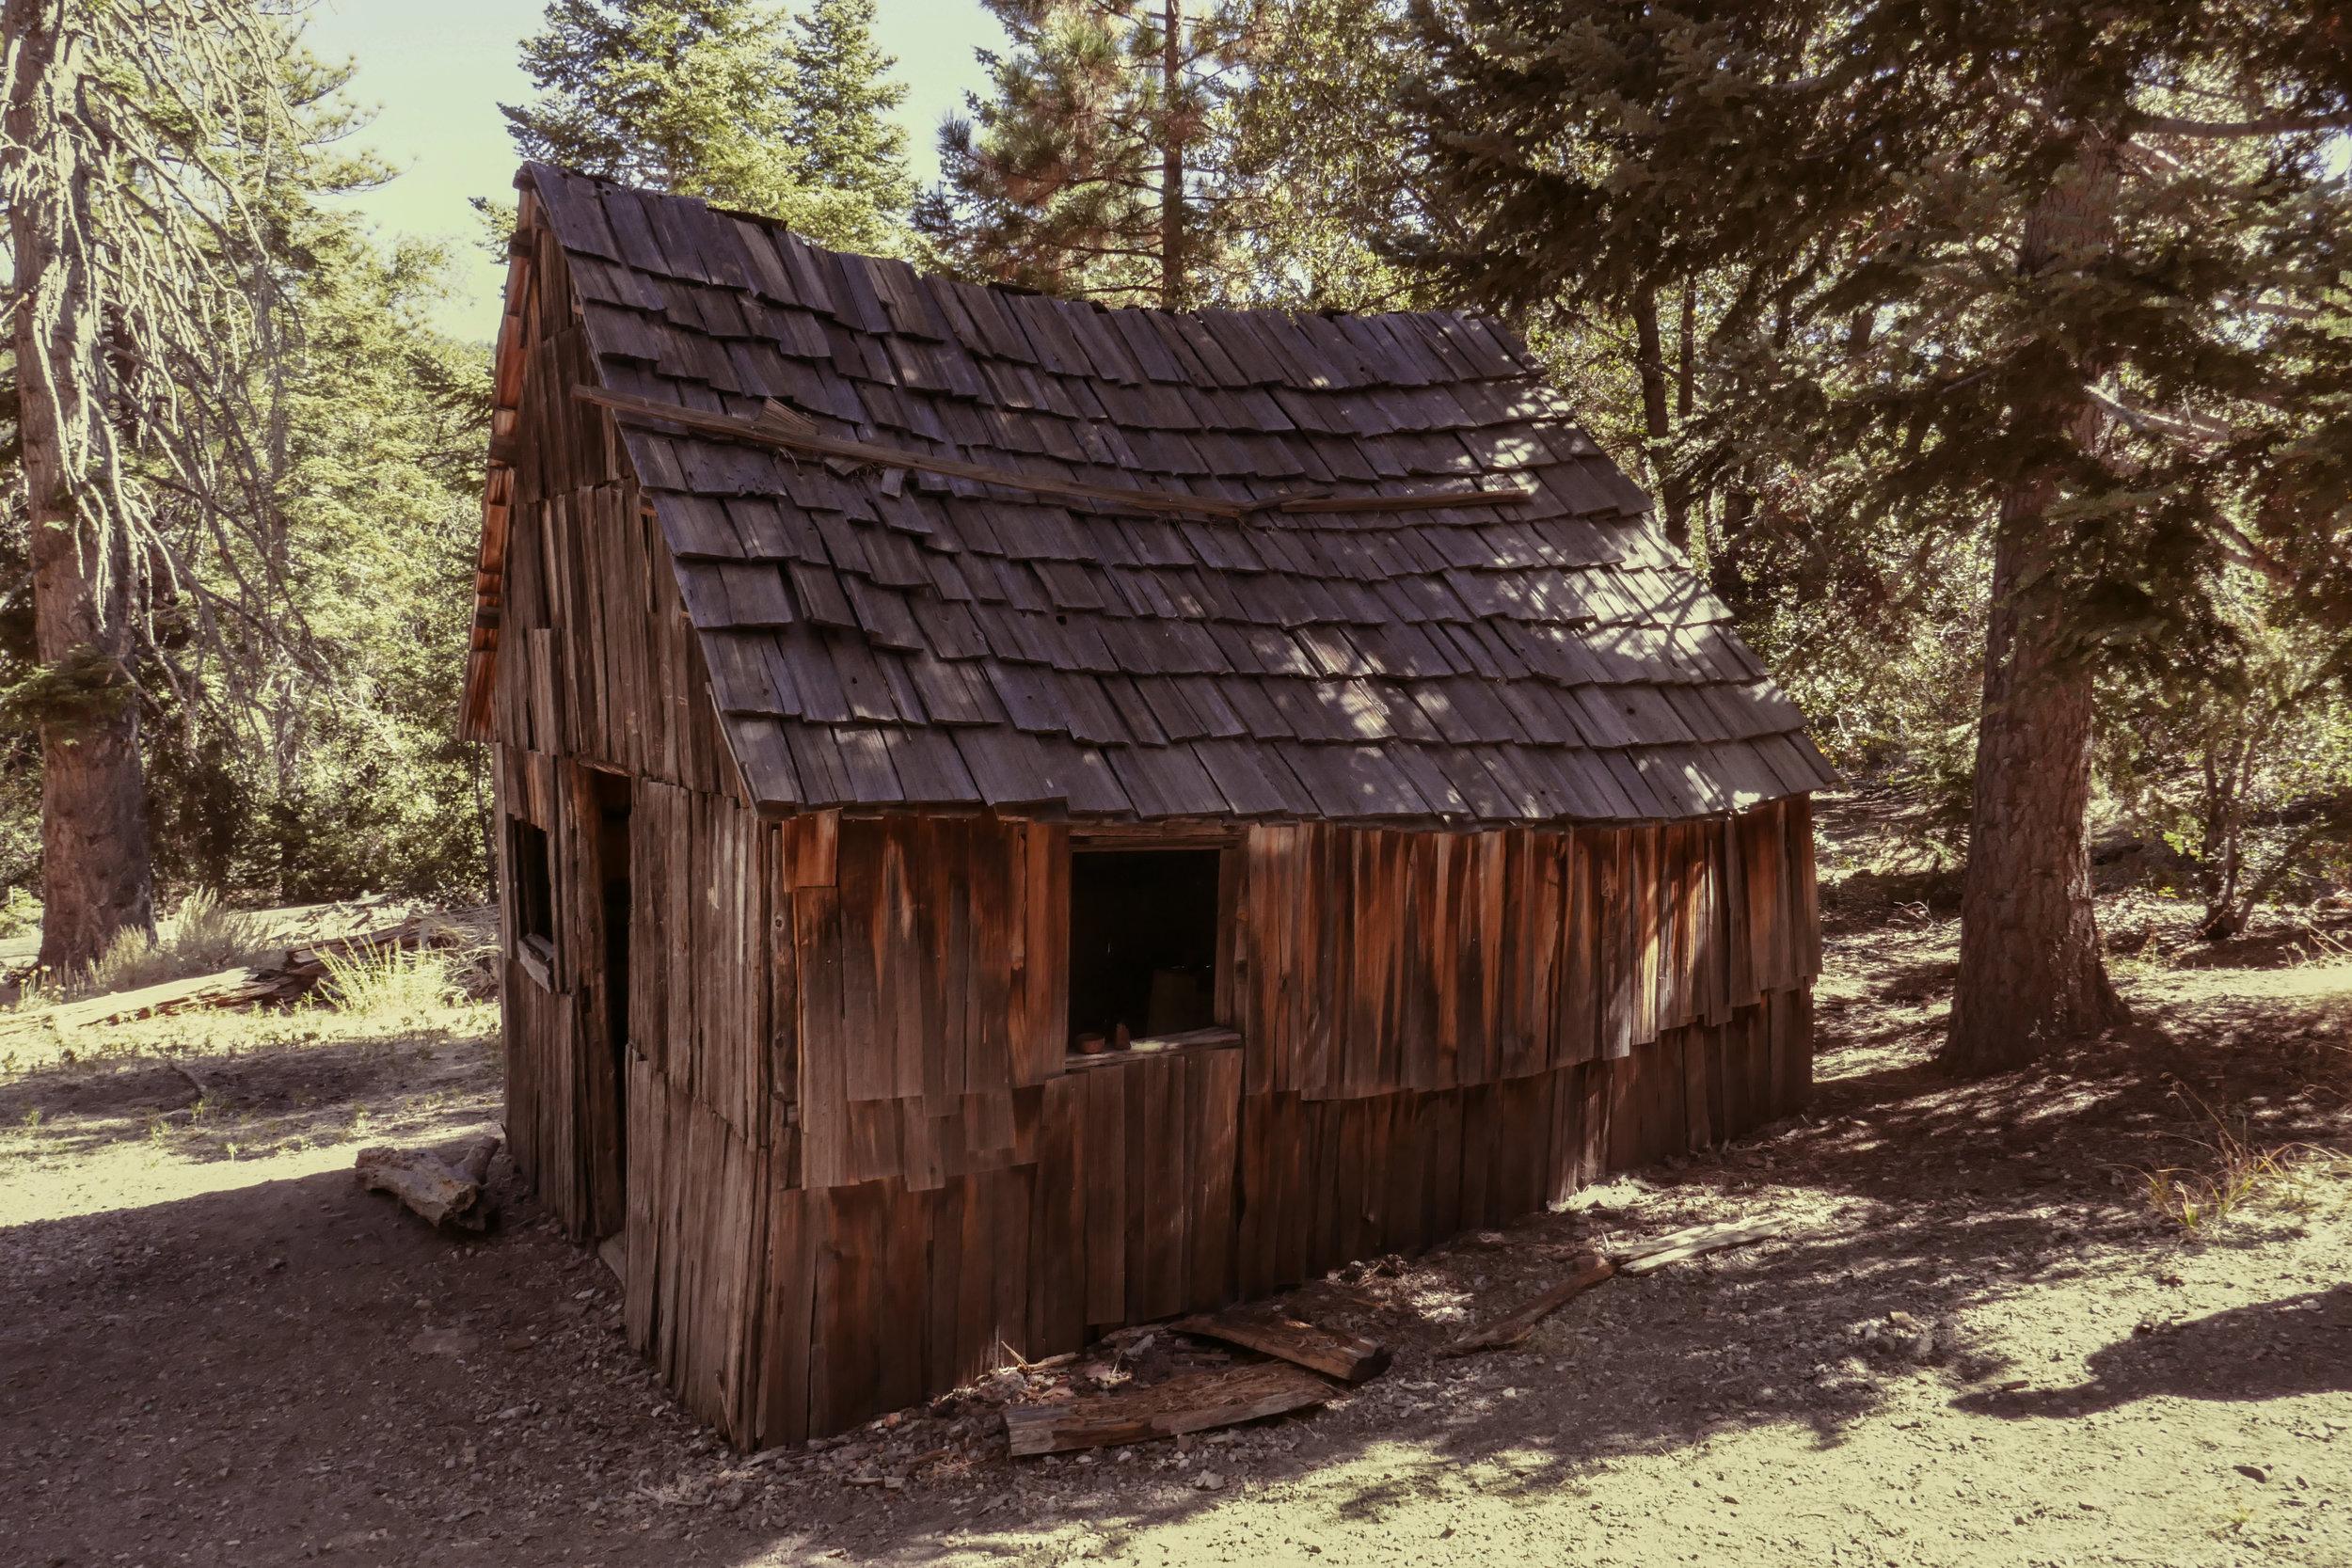 mt-baden-powell--vincents-cabin_37690787742_o.jpg